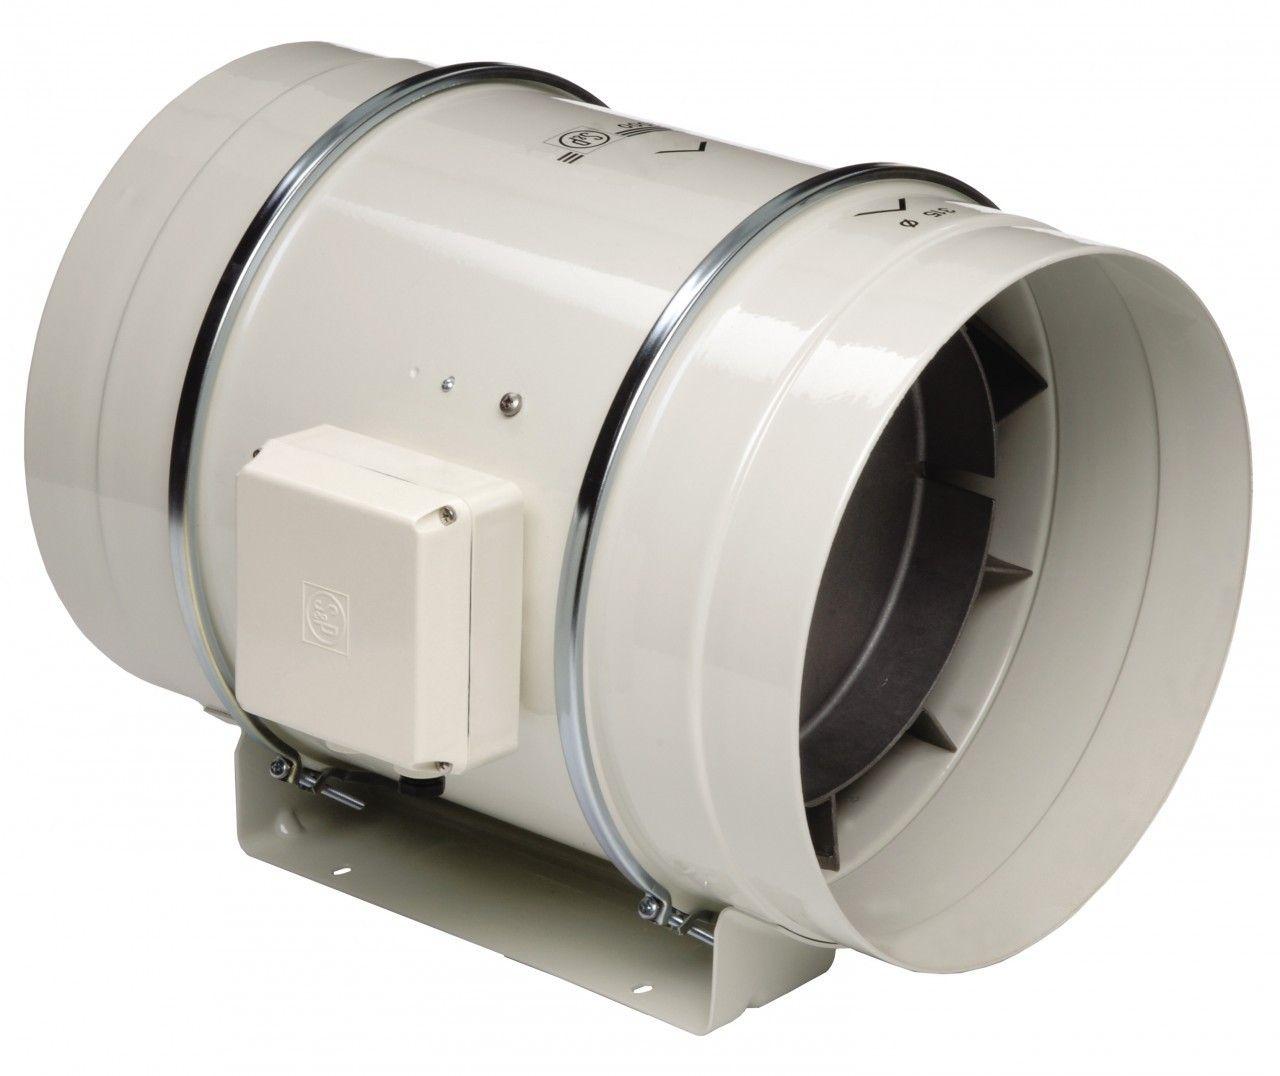 Exaustor p/ Conduto S&P TD-1300/250 MIXVENT